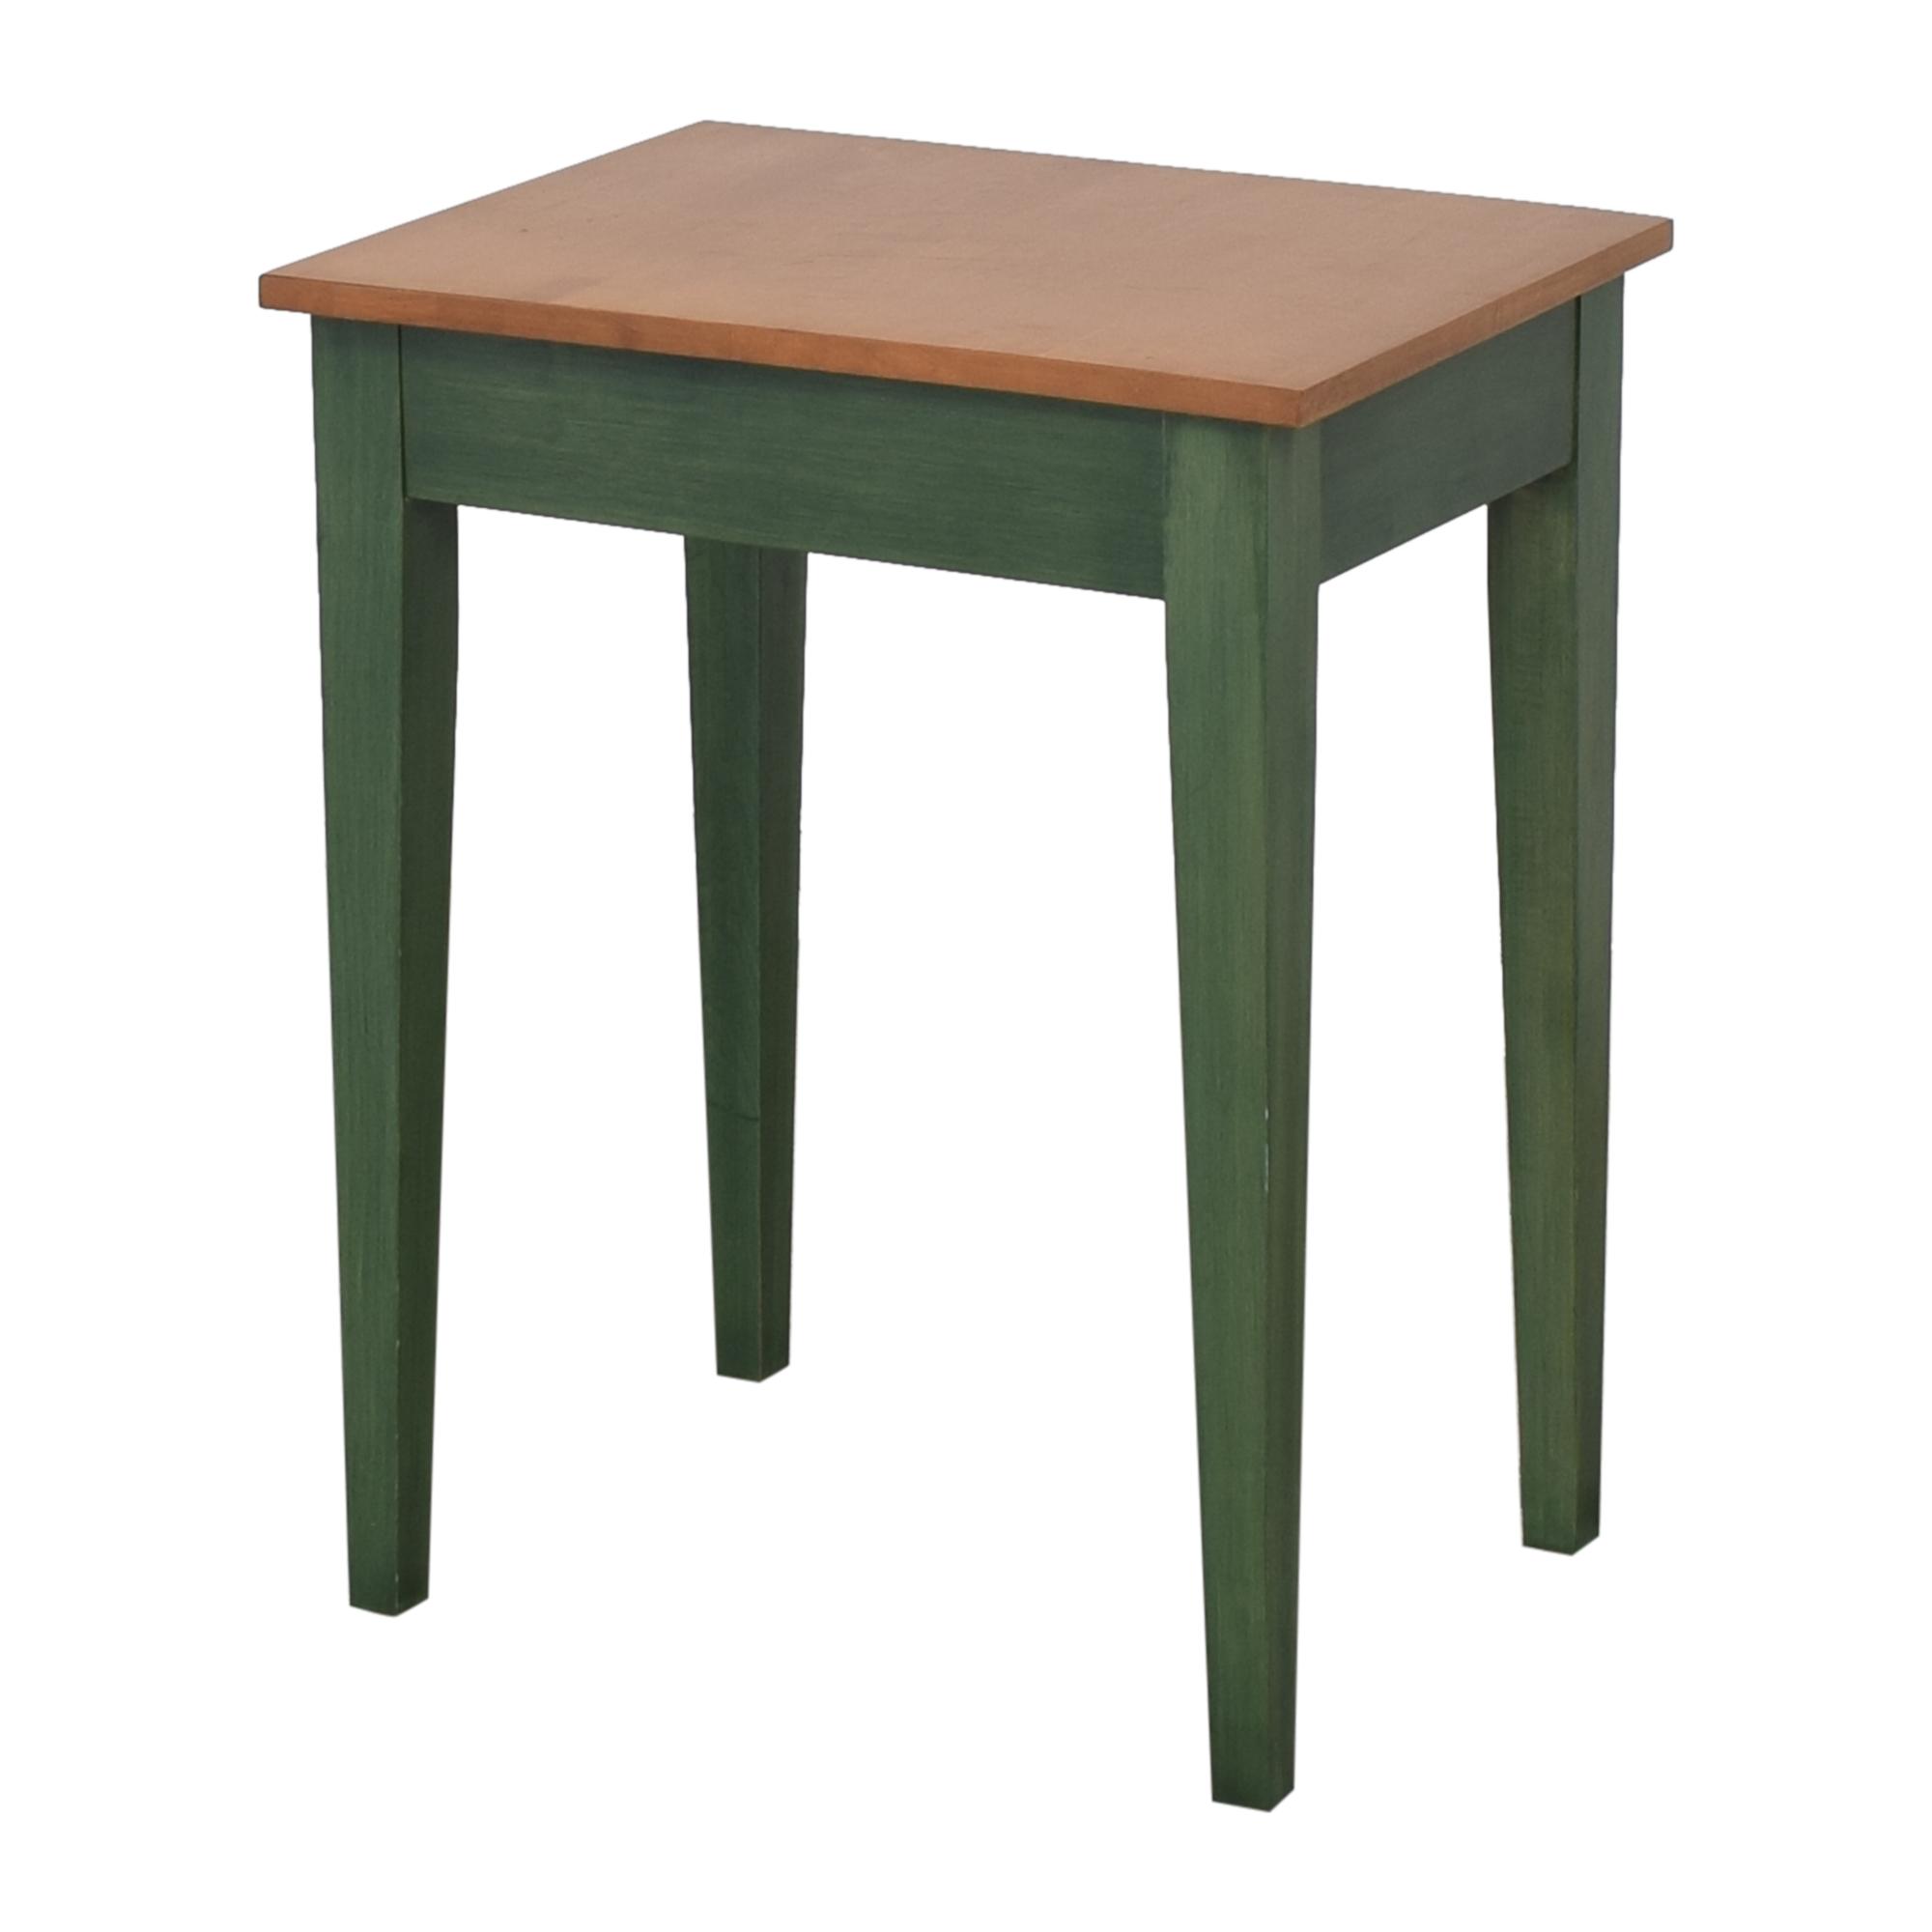 Ethan Allen Ethan Allen High Top Table for sale